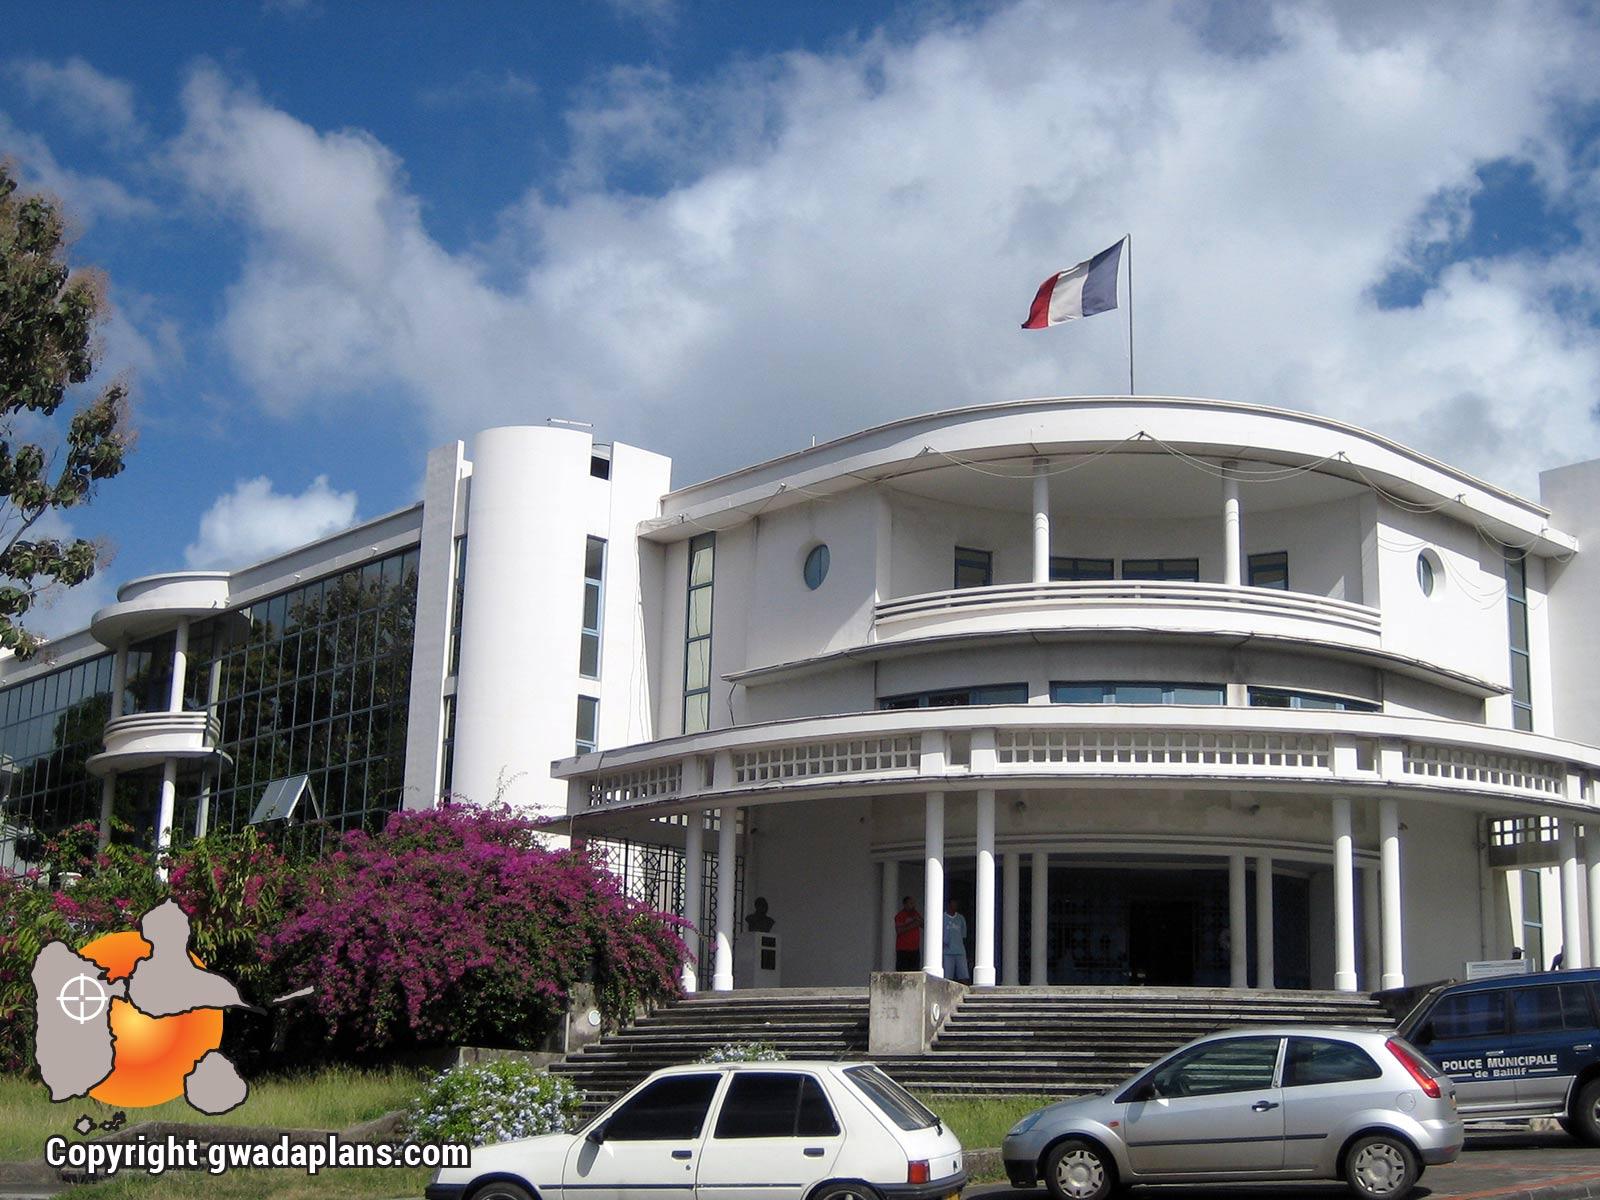 Préfecture de la Guadeloupe